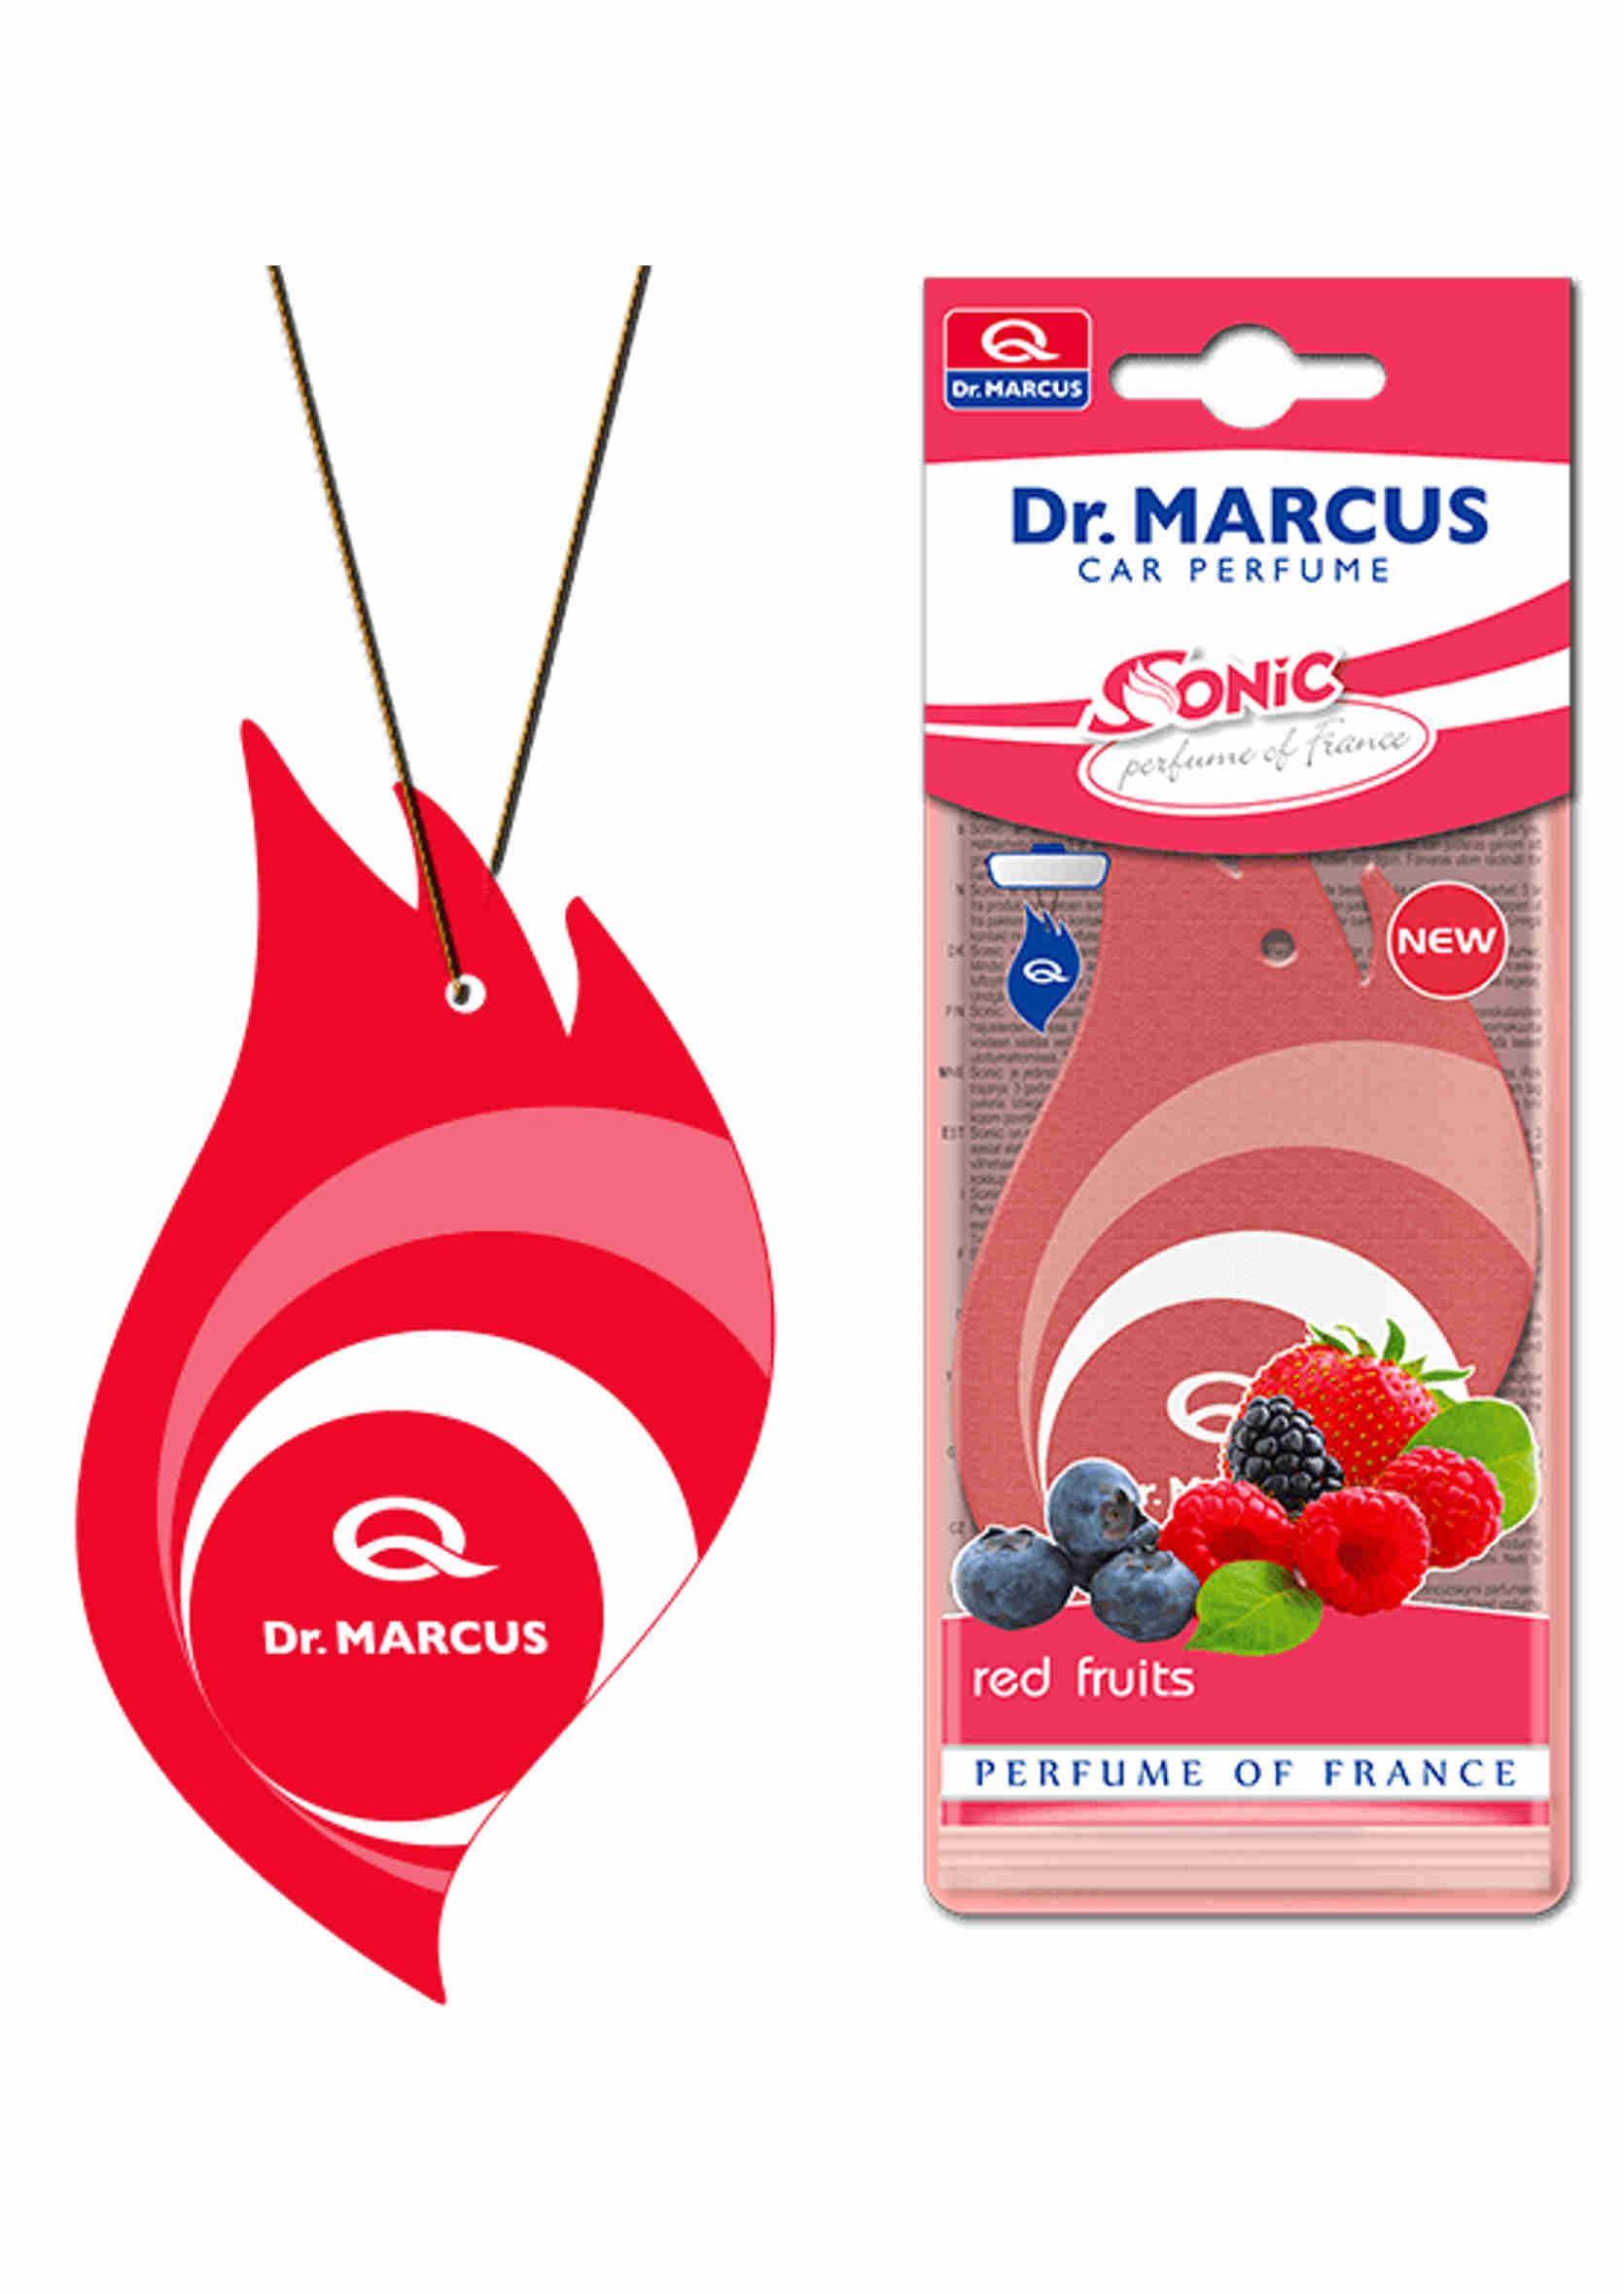 Dr. Marcus Sonic Red Fruits Listek Zapachowy Choinka Owoce Leśne